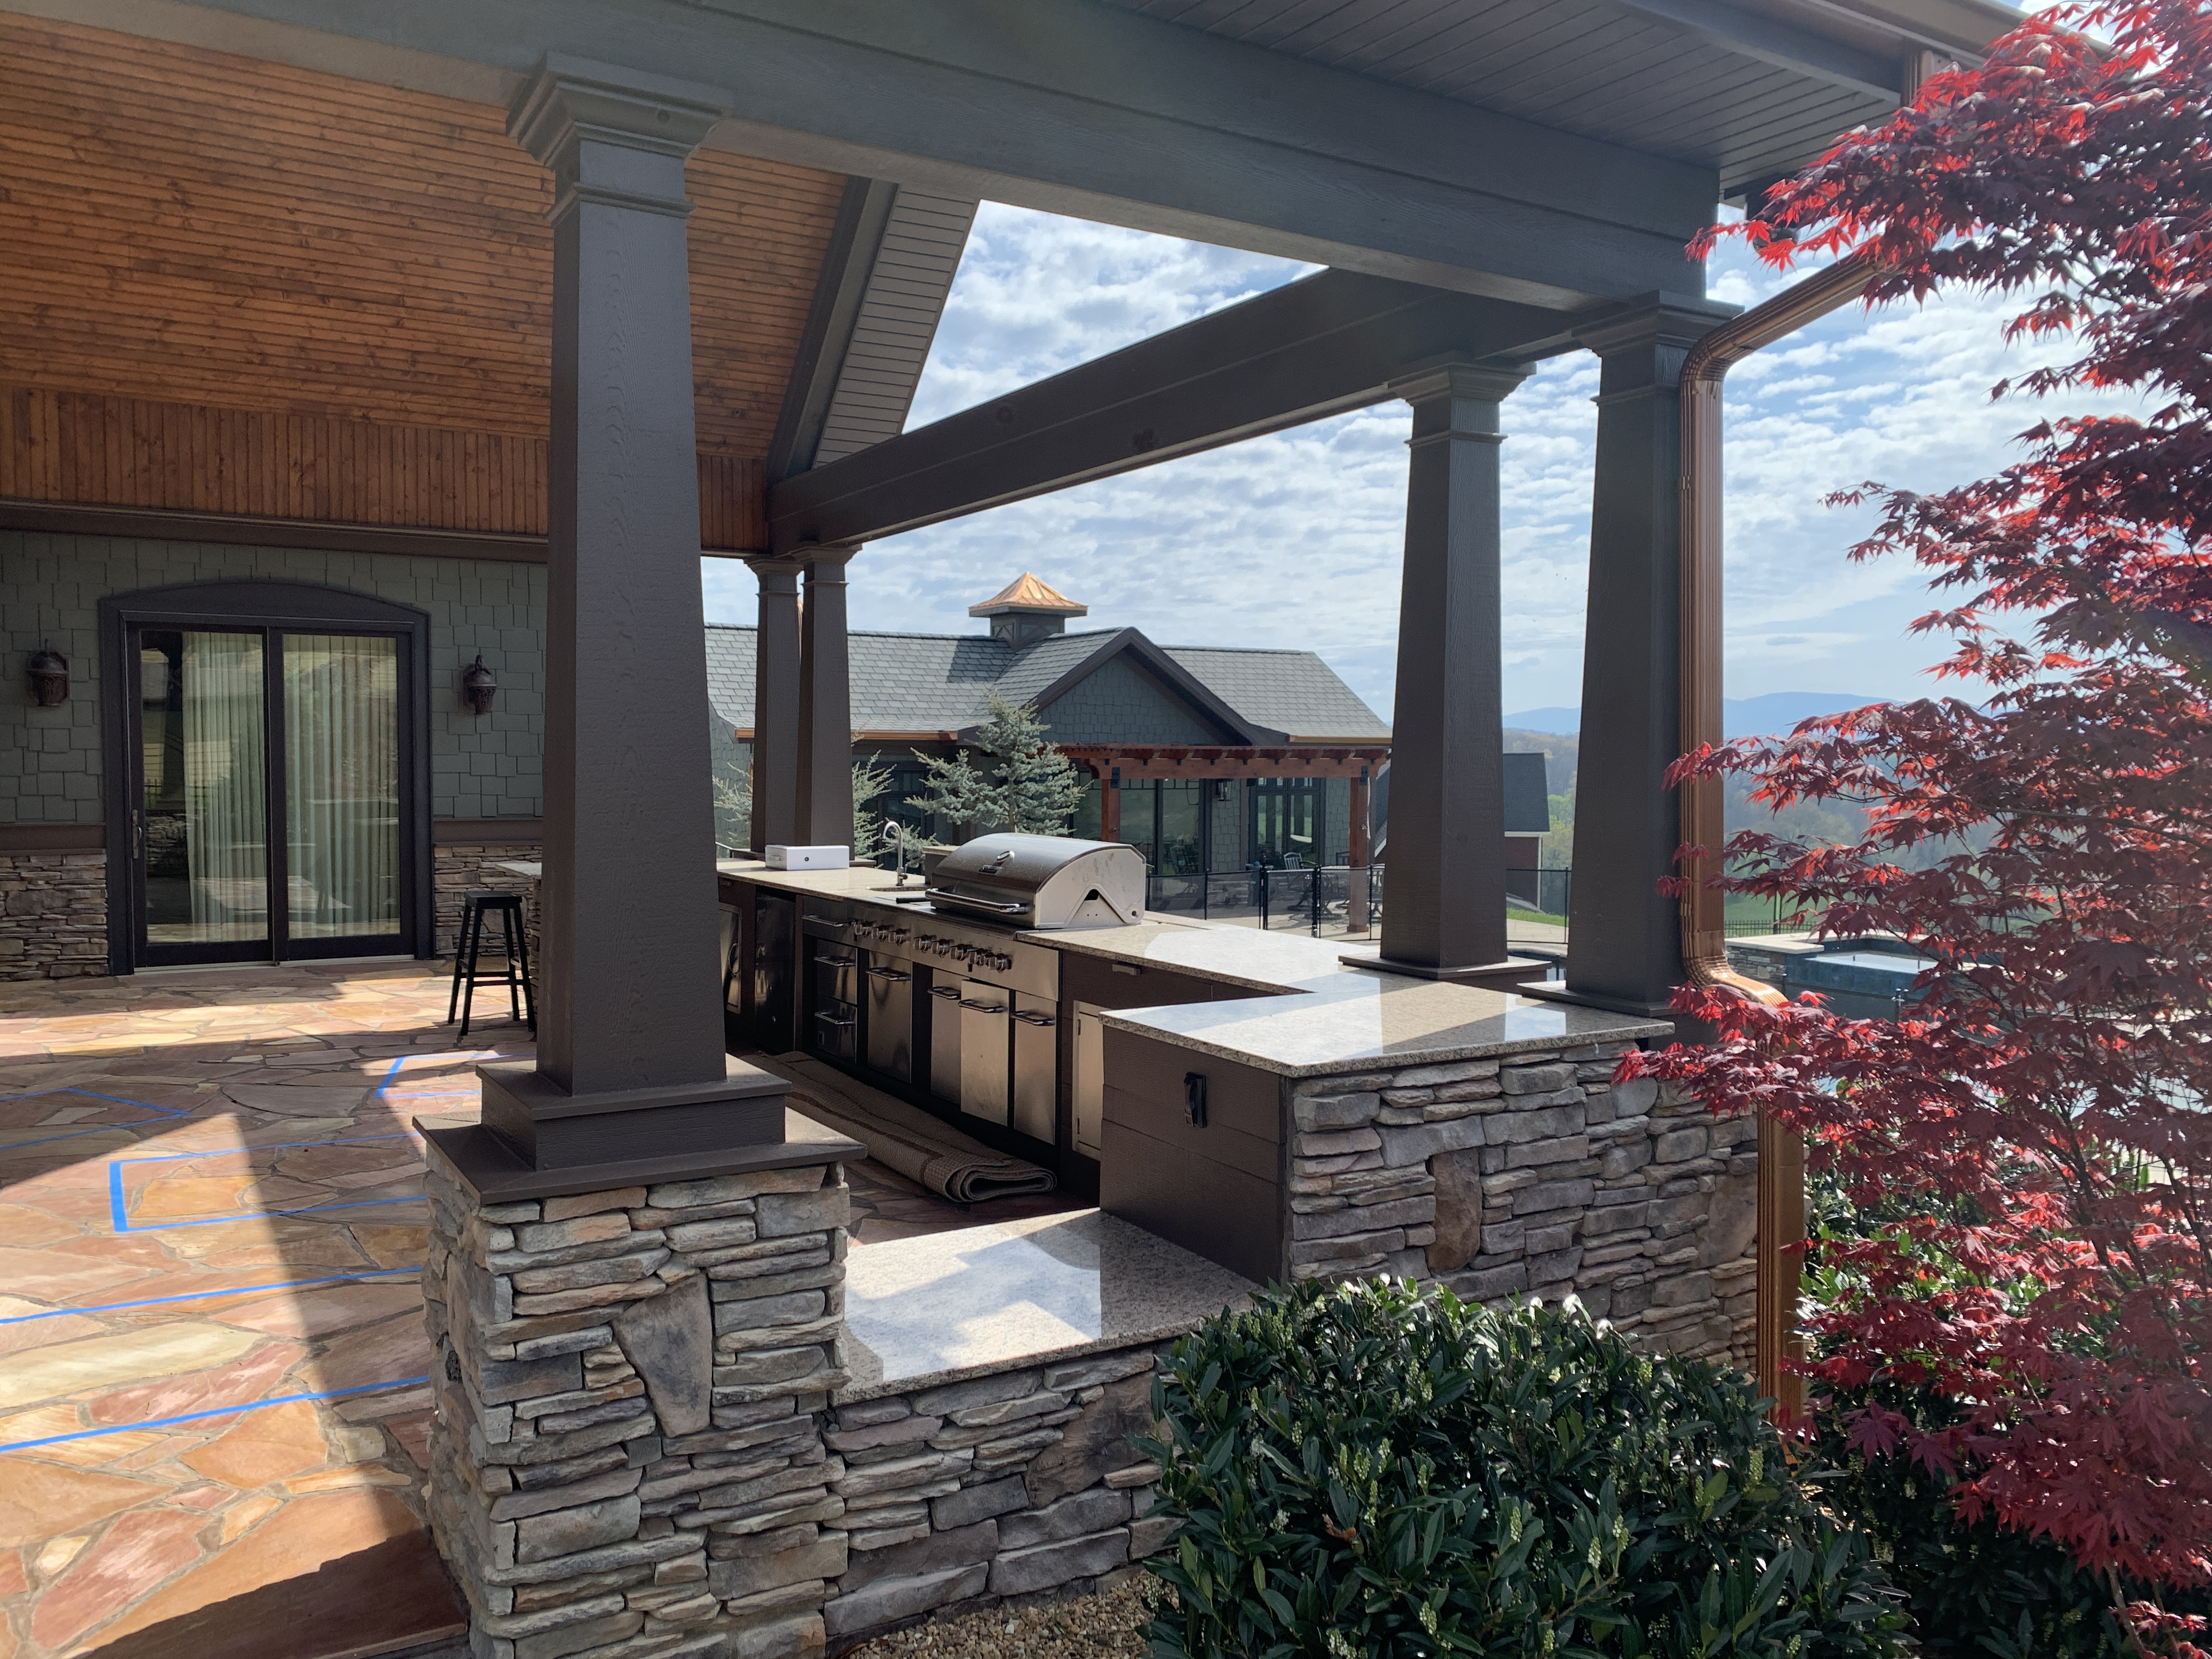 Covered Patio Ideas | Porch Enclosure Systems on Outdoor Patio Enclosure Ideas  id=14864